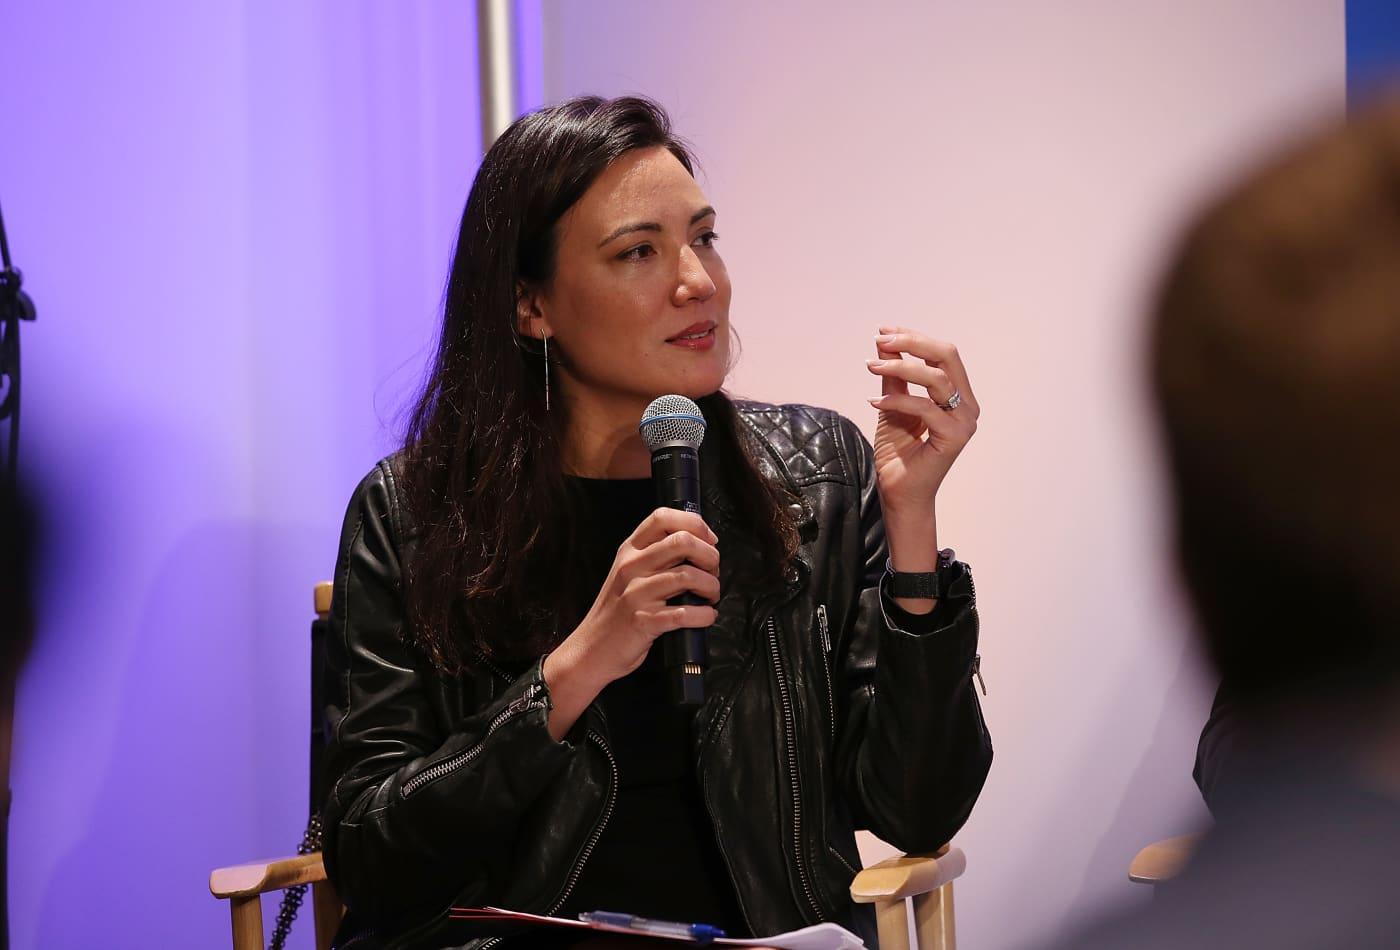 How HBO's 'Westworld' co-creator Lisa Joy became a writer